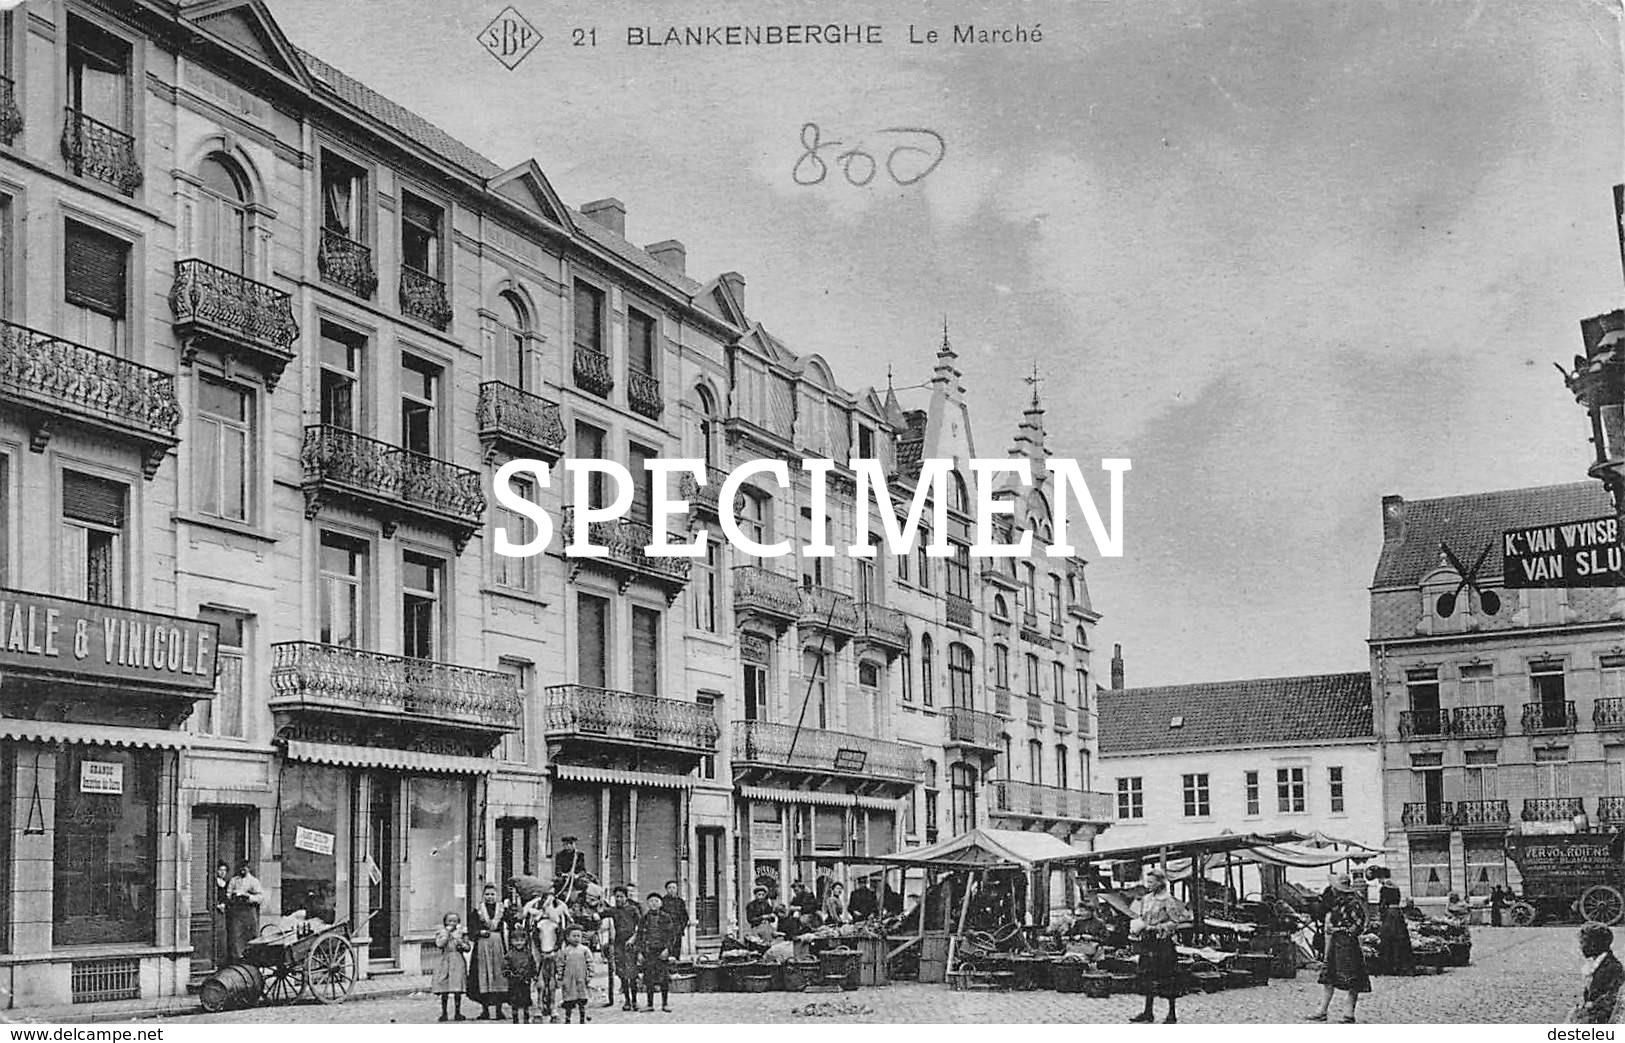 SBP 21 Le Marché - Blankenberge - Blankenberge